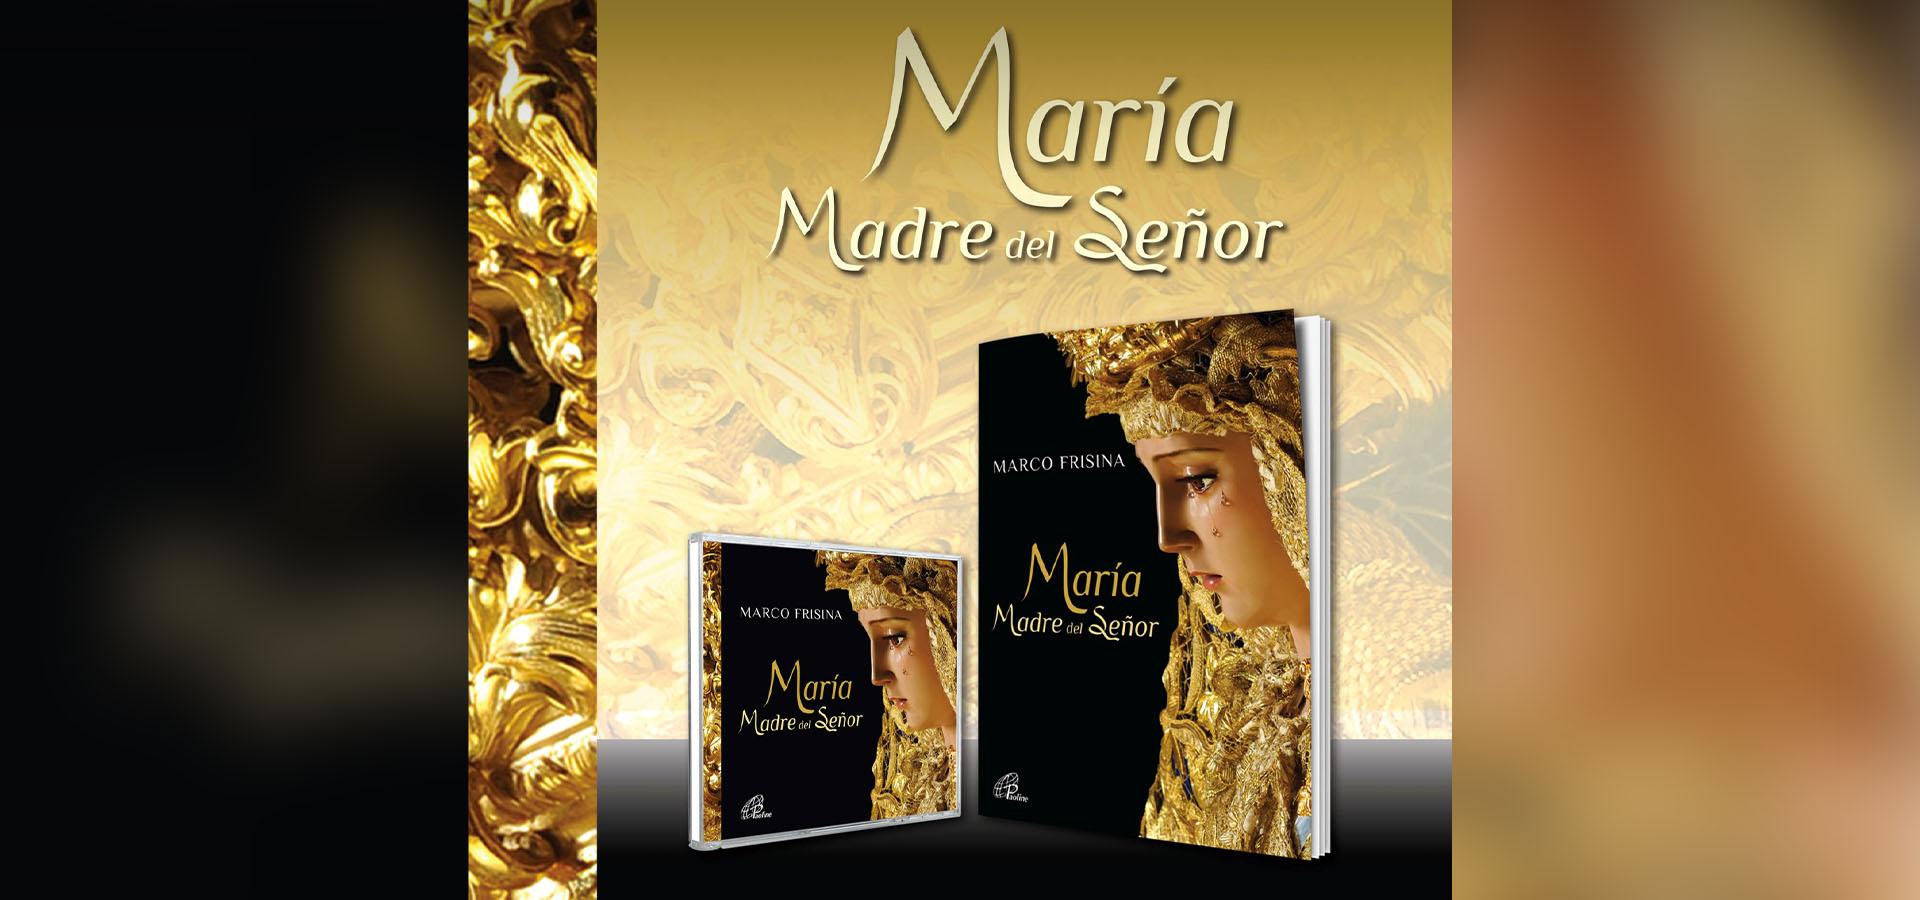 Maria-madre-del-Signore-ES